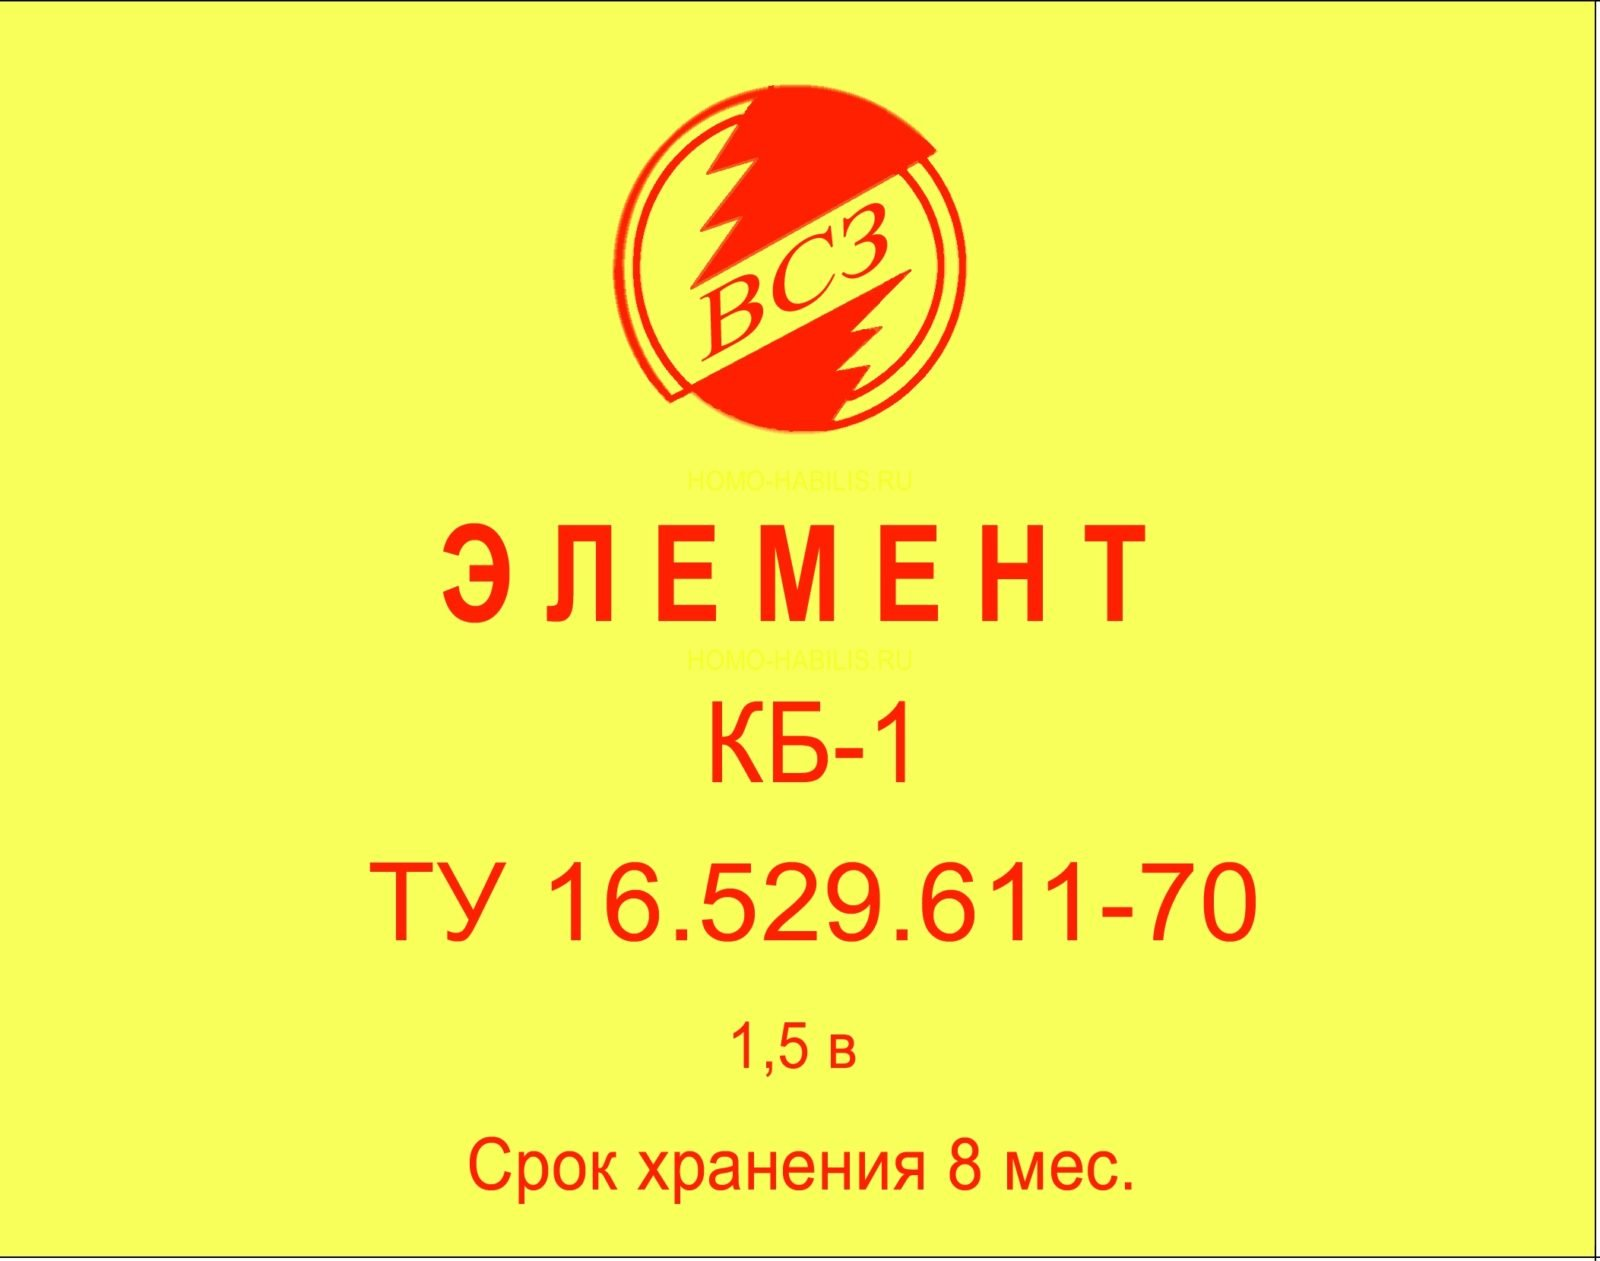 Этикетка на КБ 1